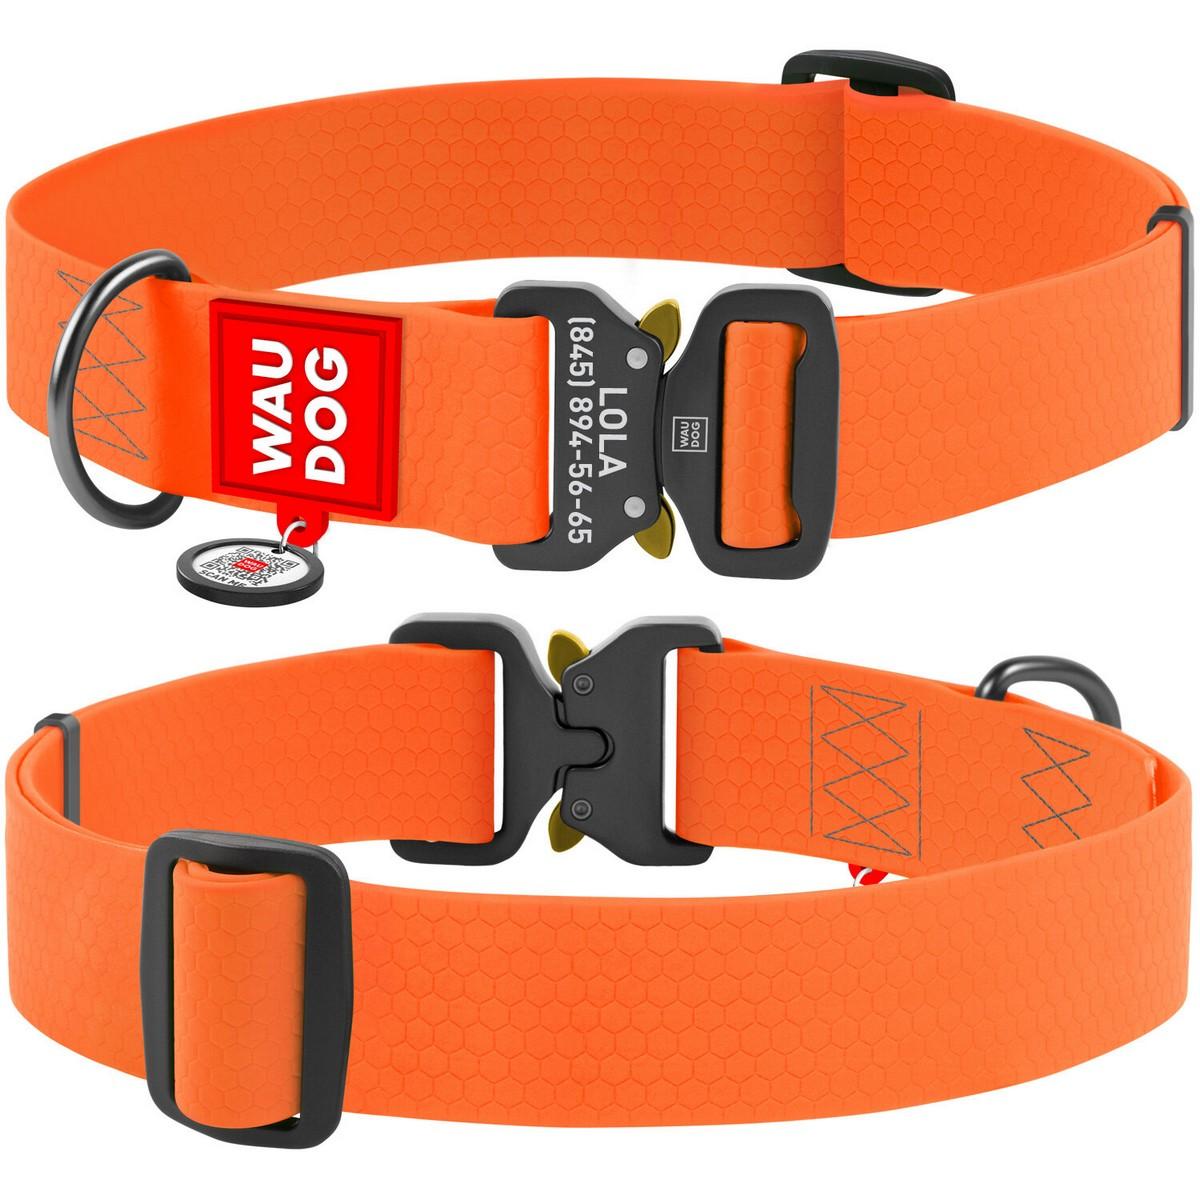 Нашийник для собак водостійкий WAUDOG Waterproof c QR паспортом, металева пряжка-фастекс, помаранчевий XXL (ширина 40 мм, довжина 43-70см)